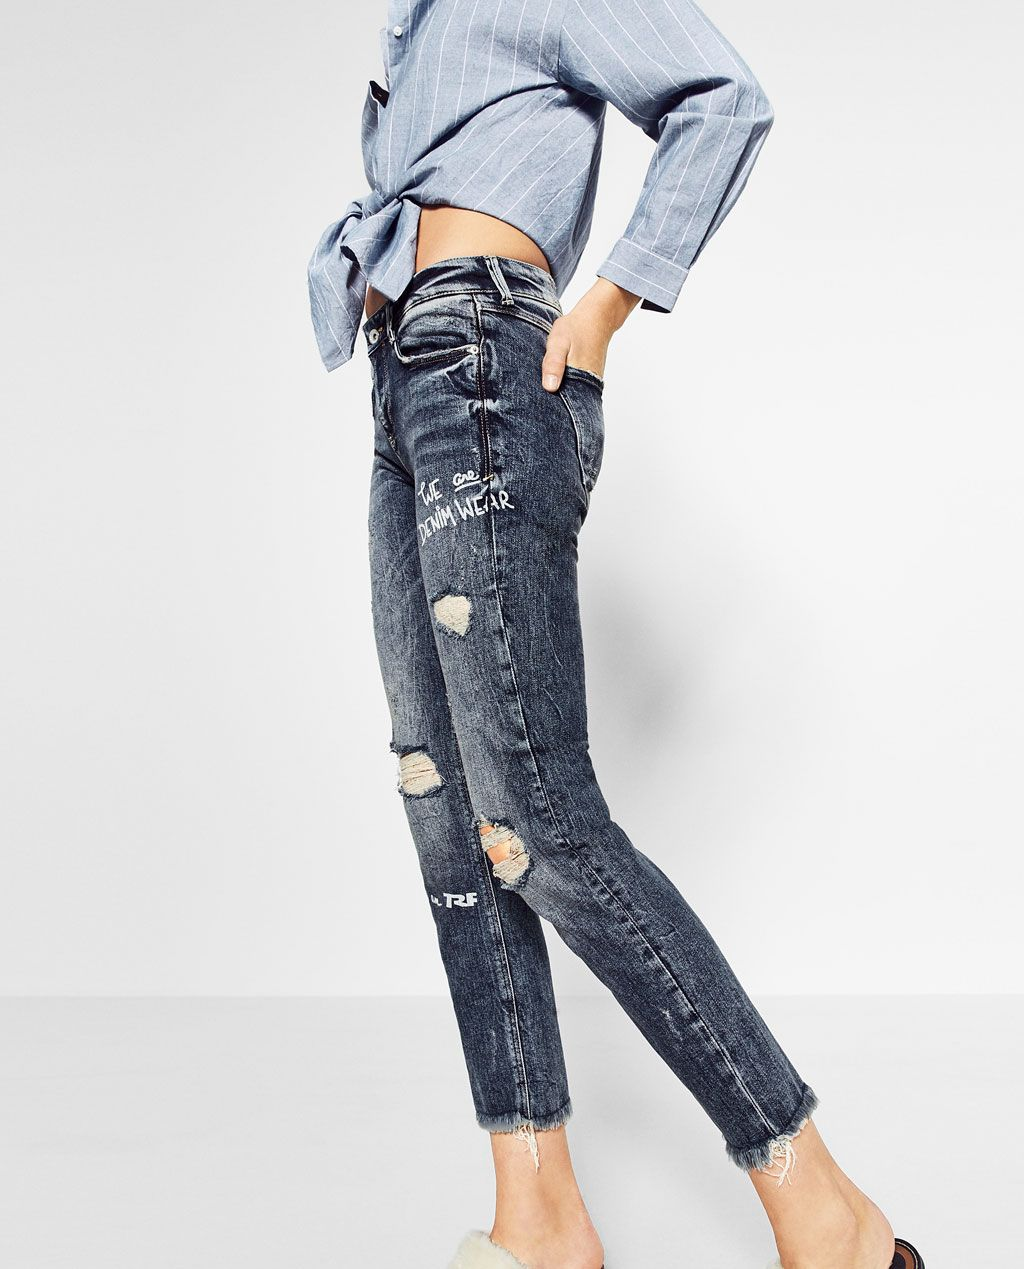 Printed slim fit jeans view alljeanswoman zara